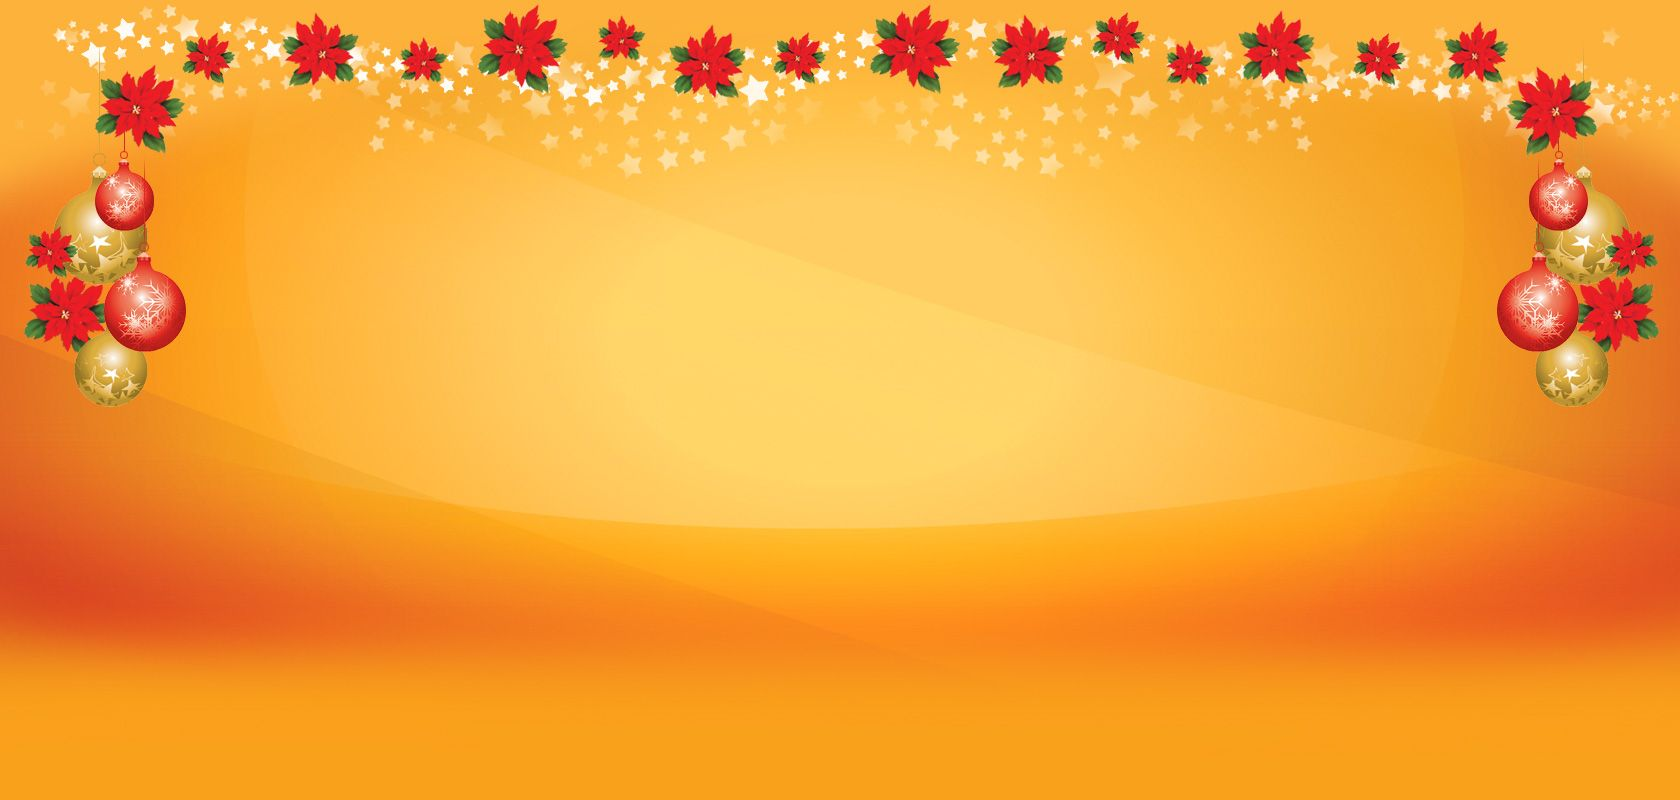 Tarjetas navidad 2015 gratis para el m vil 9 hd wallpapers - Tarjetas de navidad artesanales ...